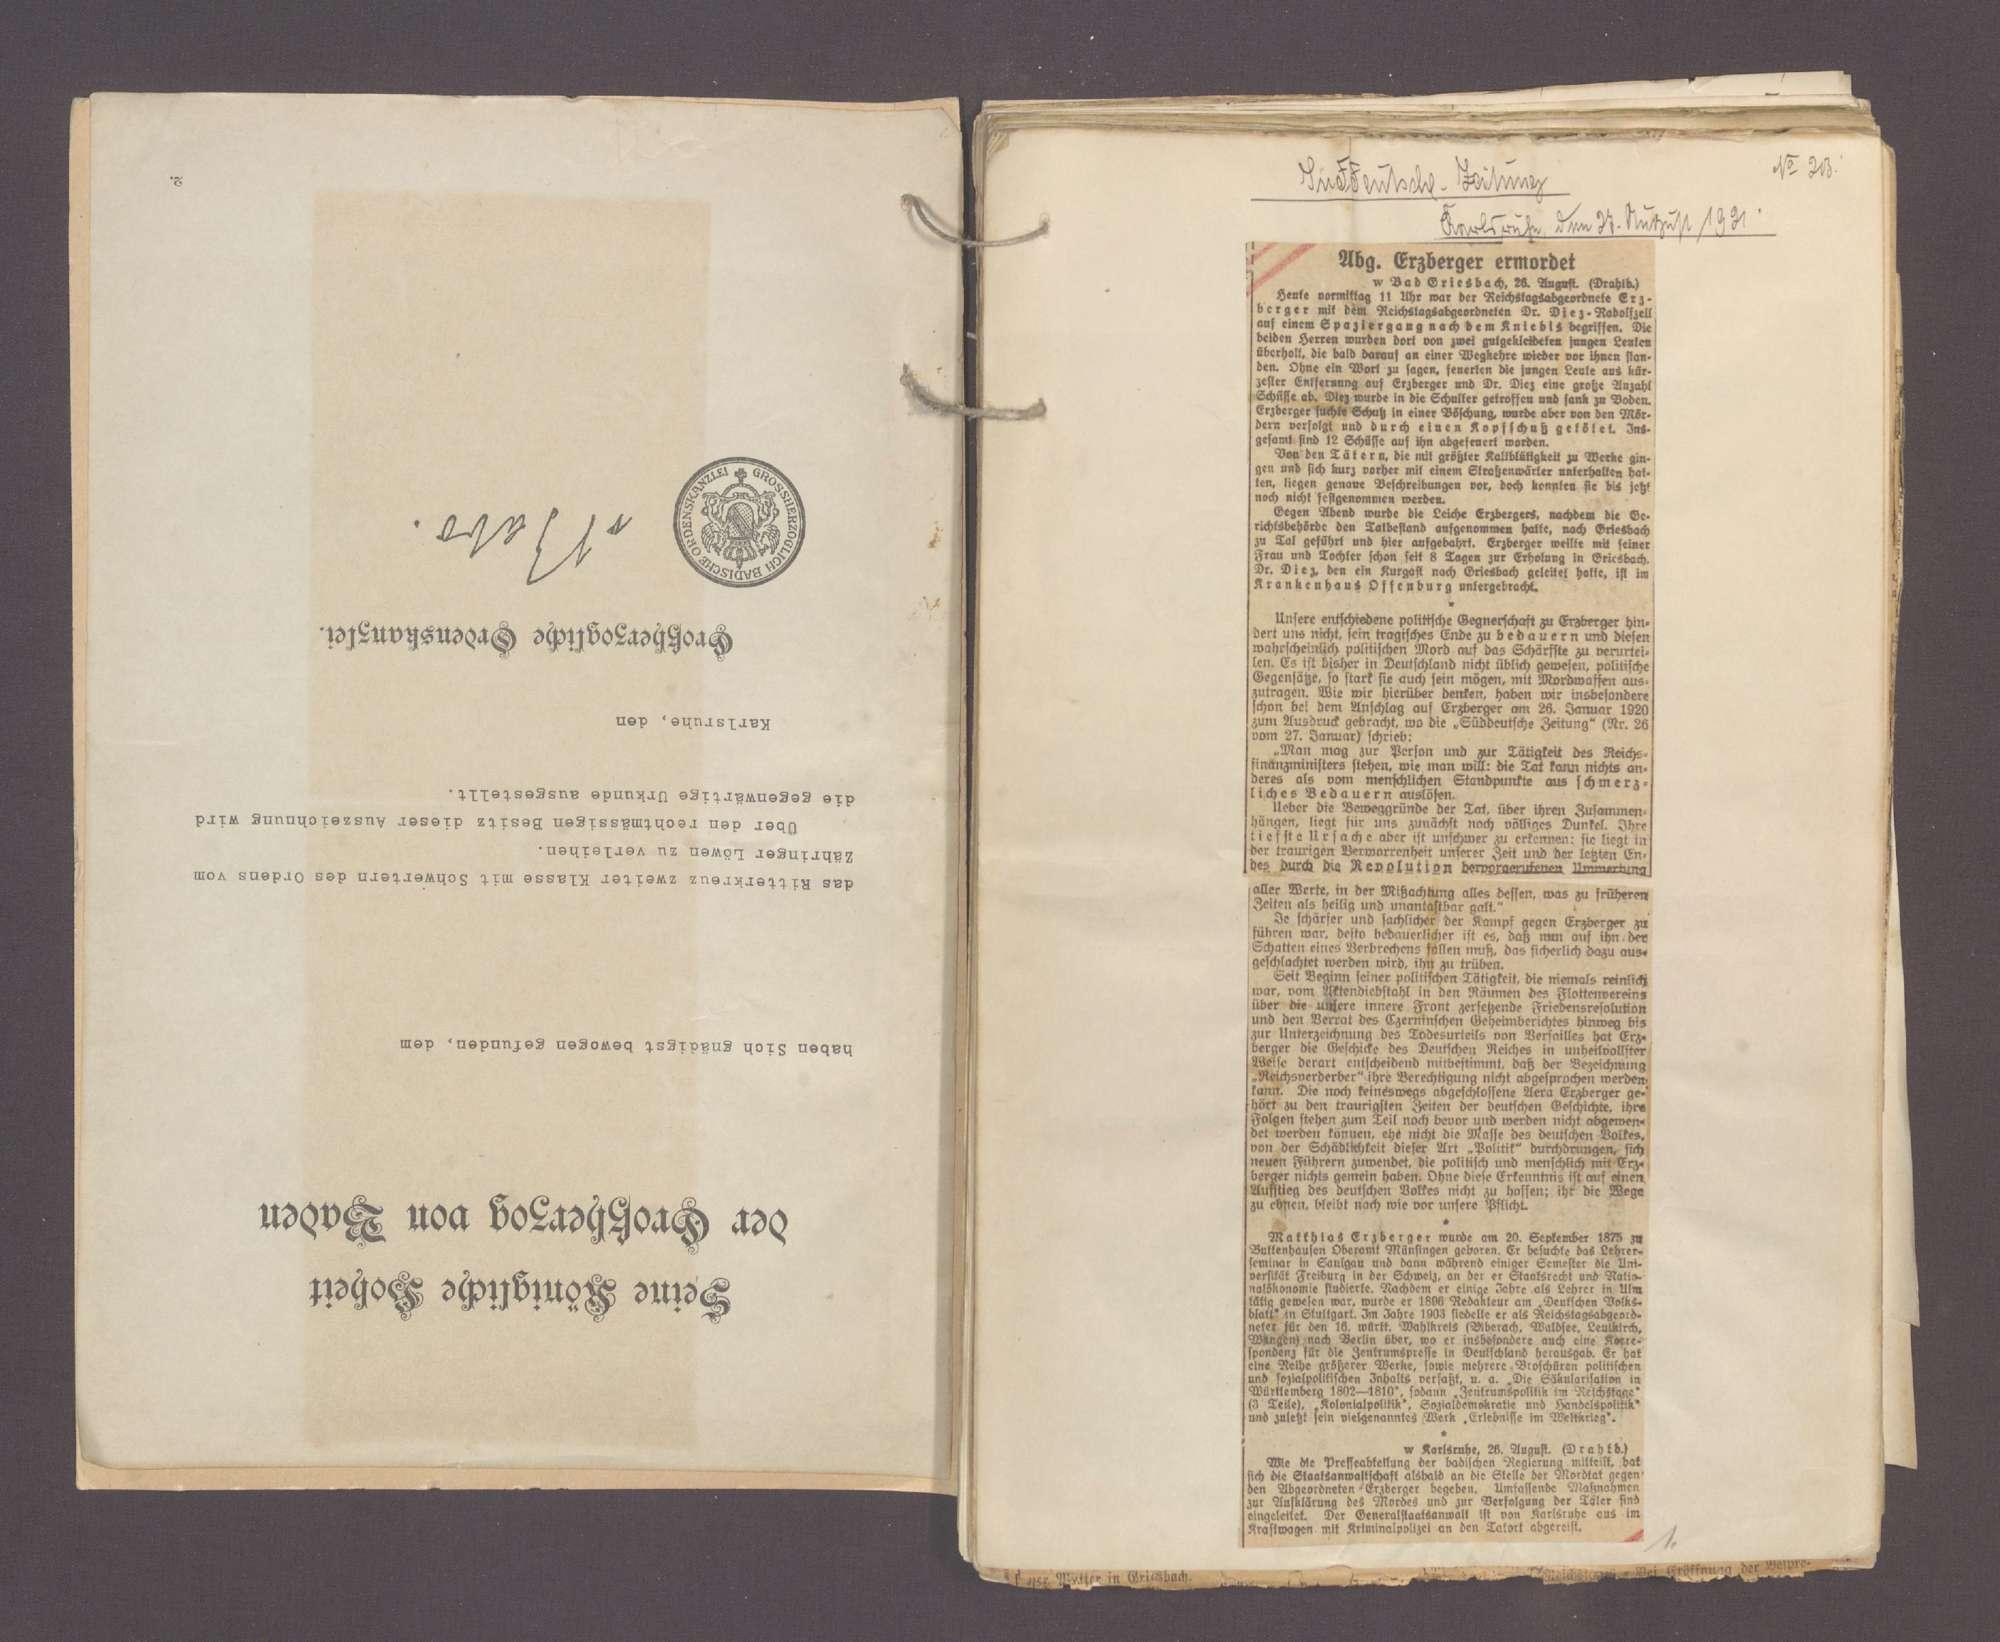 Zeitungsausschnitte zur Ermordung des Reichsfinanzmininsters a. D. Erzberger, Bild 3